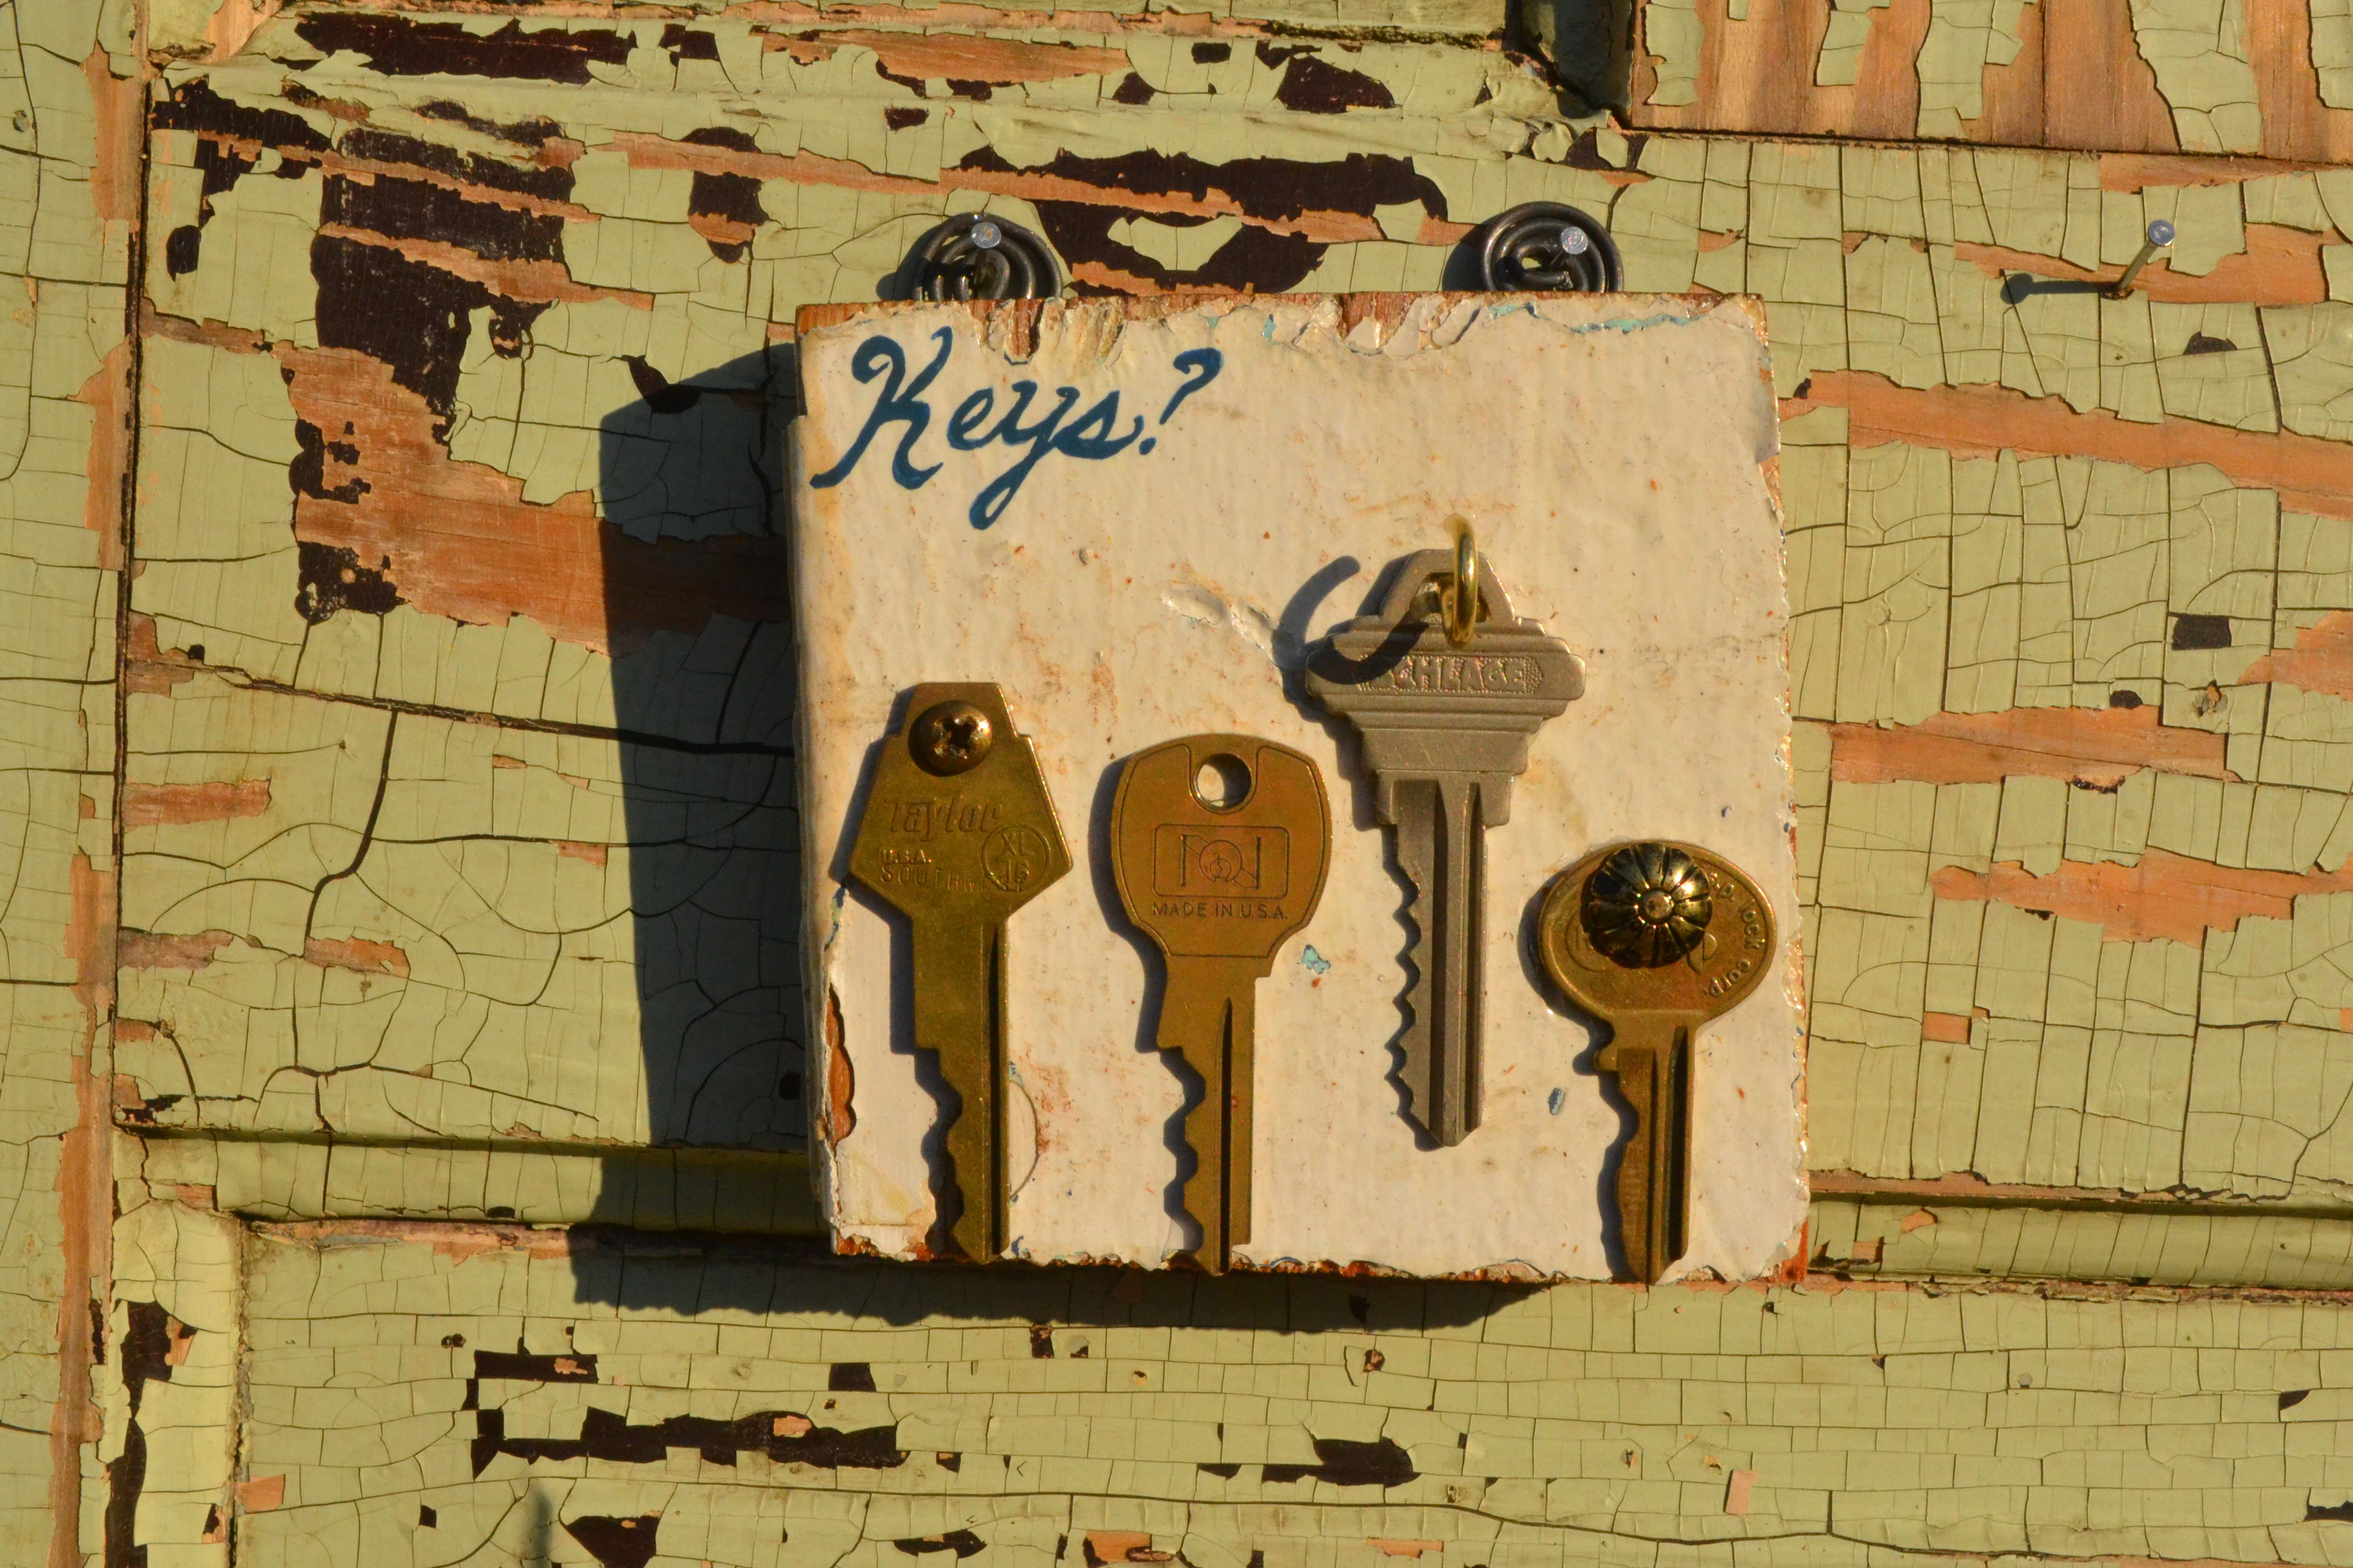 Keys?